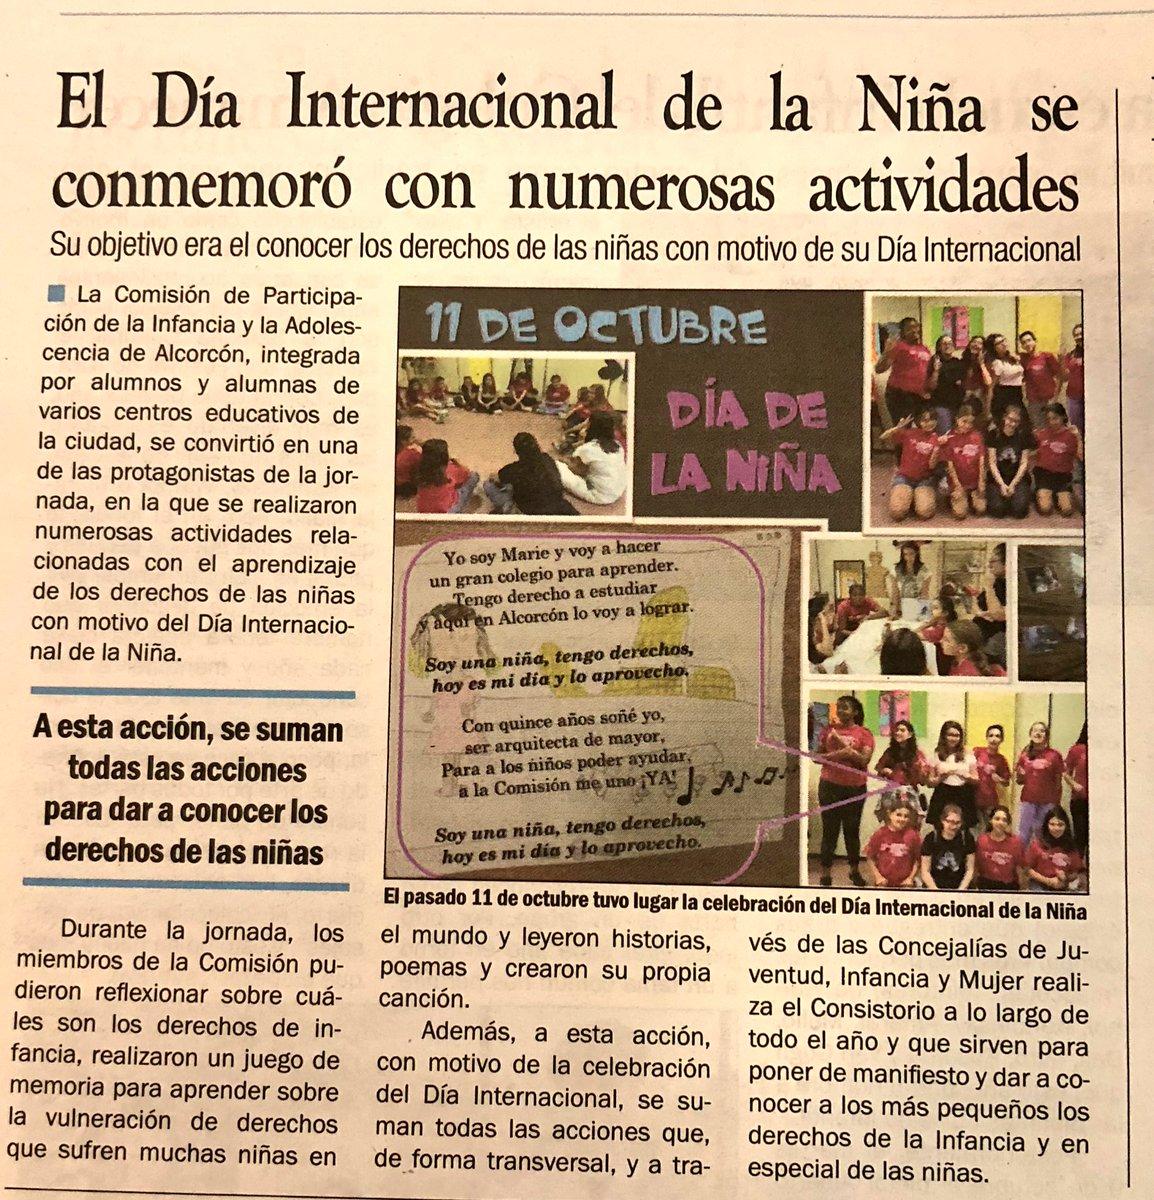 #DíaInternacionalDeLaNiña Latest News Trends Updates Images - ppalcorcon